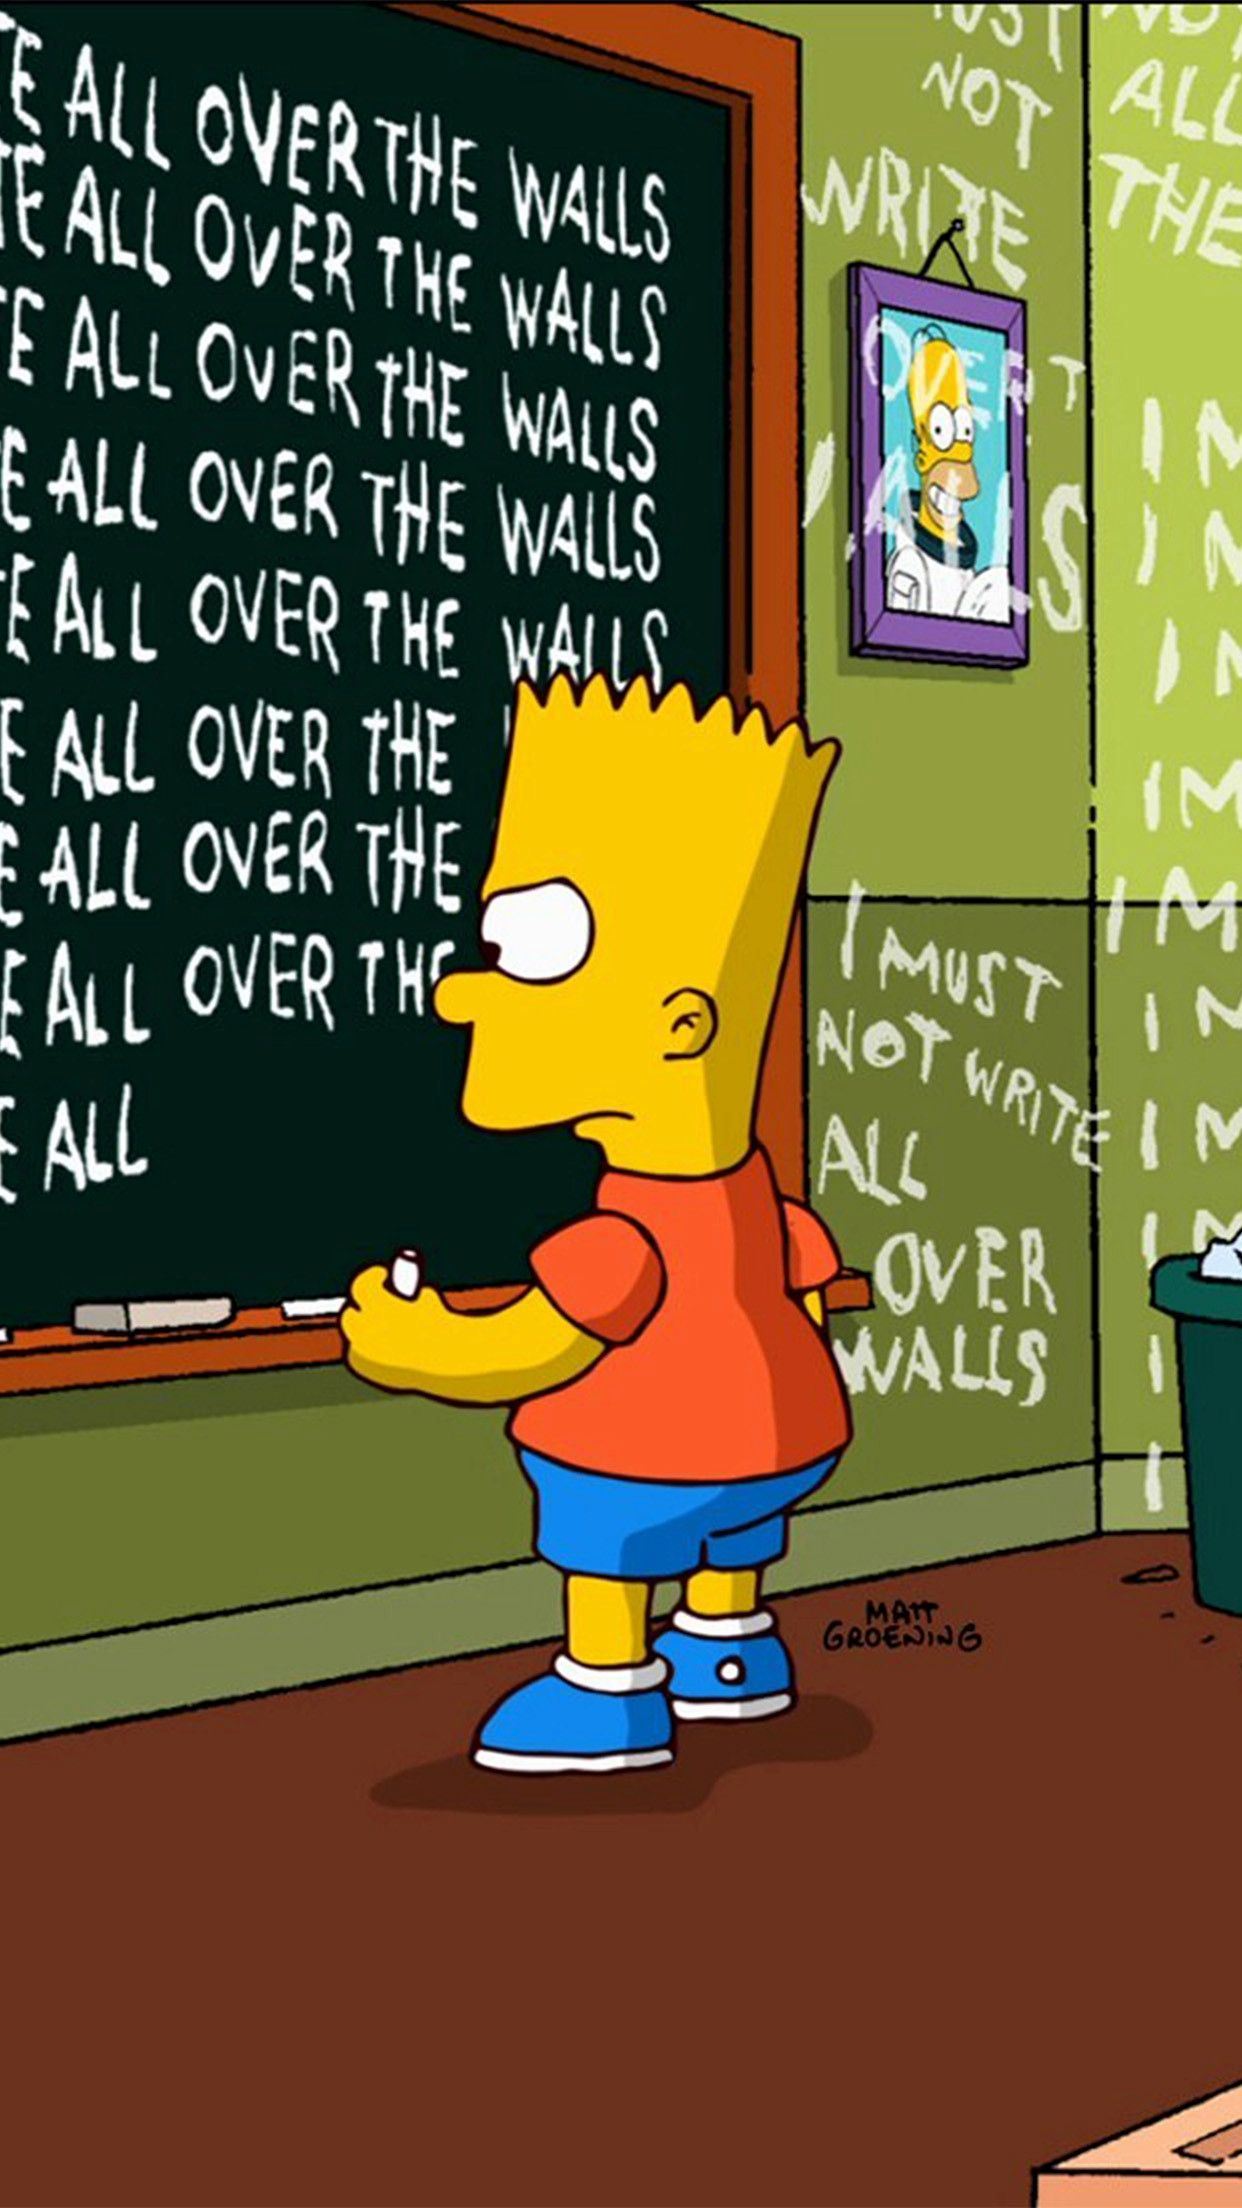 Depressed Bart Simpson Wallpapers Top Free Depressed Bart Simpson Backgrounds Wallpaperaccess